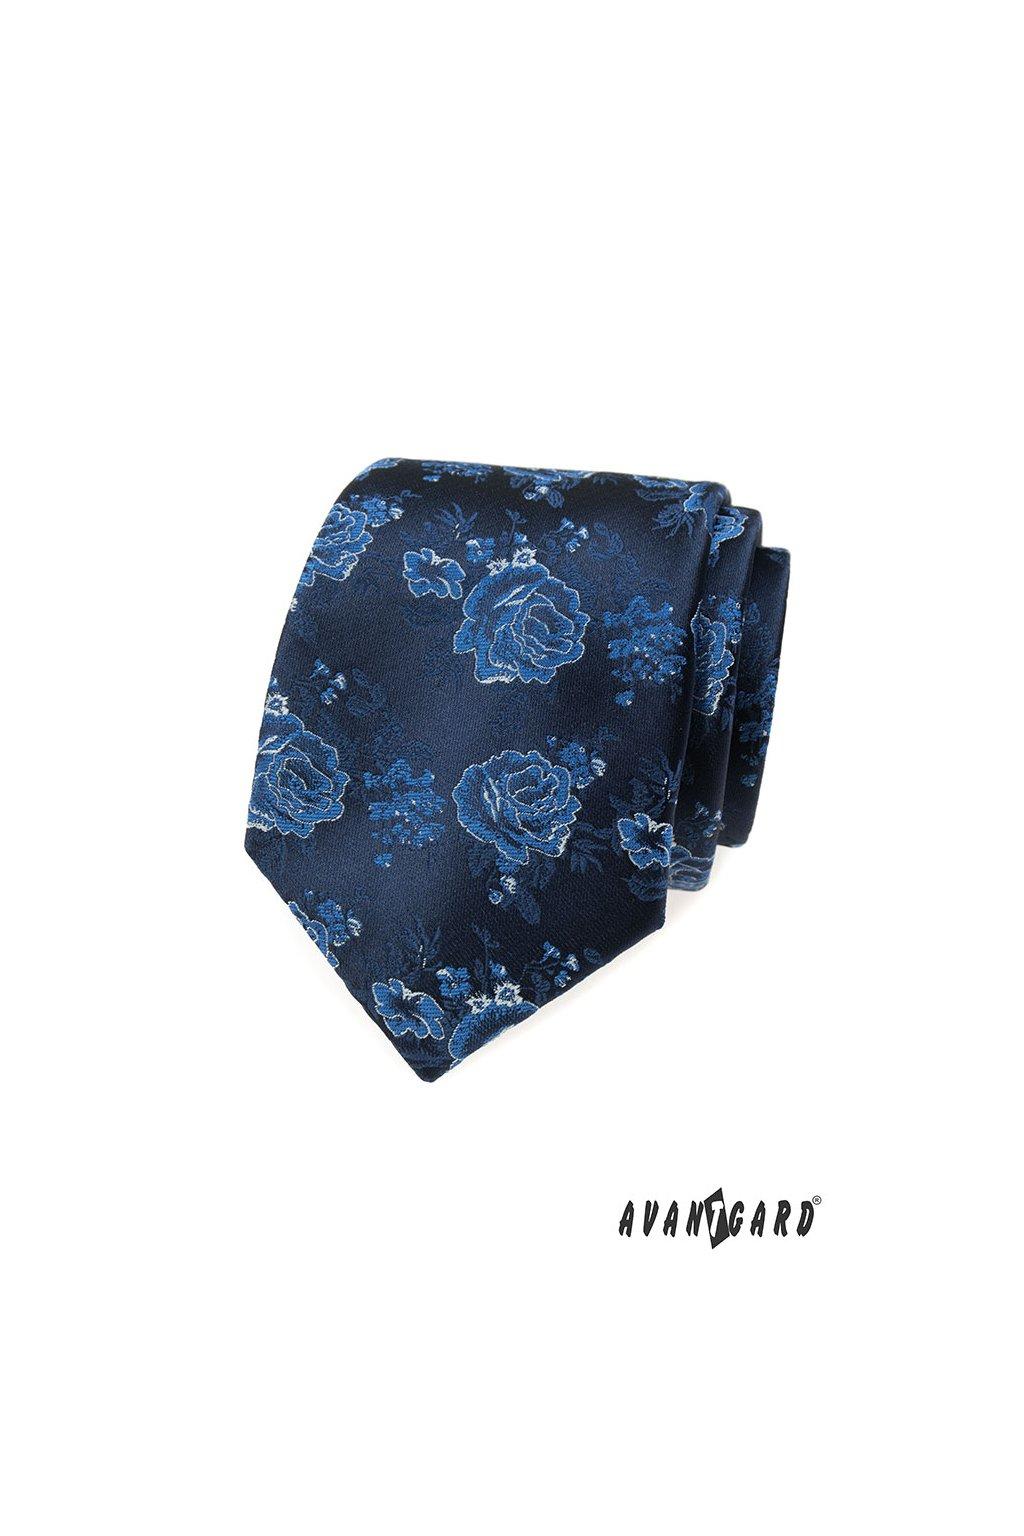 Kravata LUX, 561-62379, Modrá